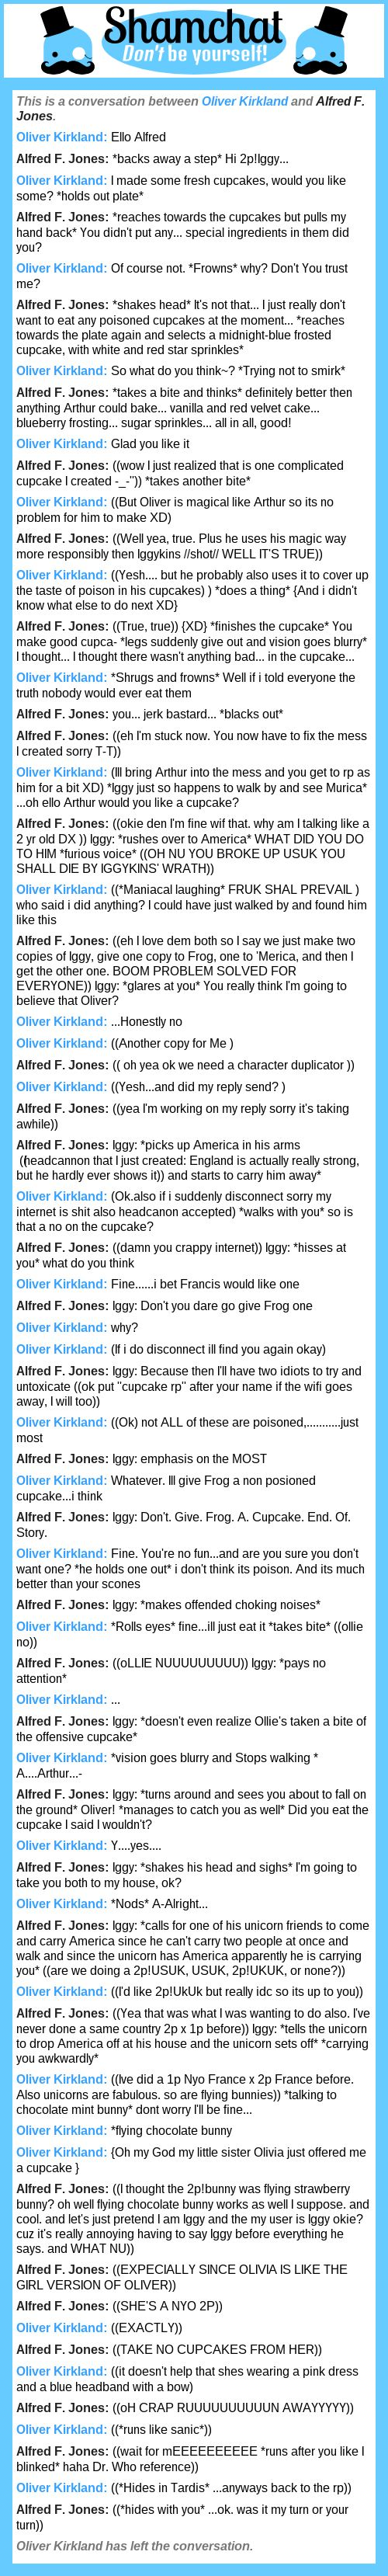 A conversation between Alfred F. Jones and Oliver Kirkland